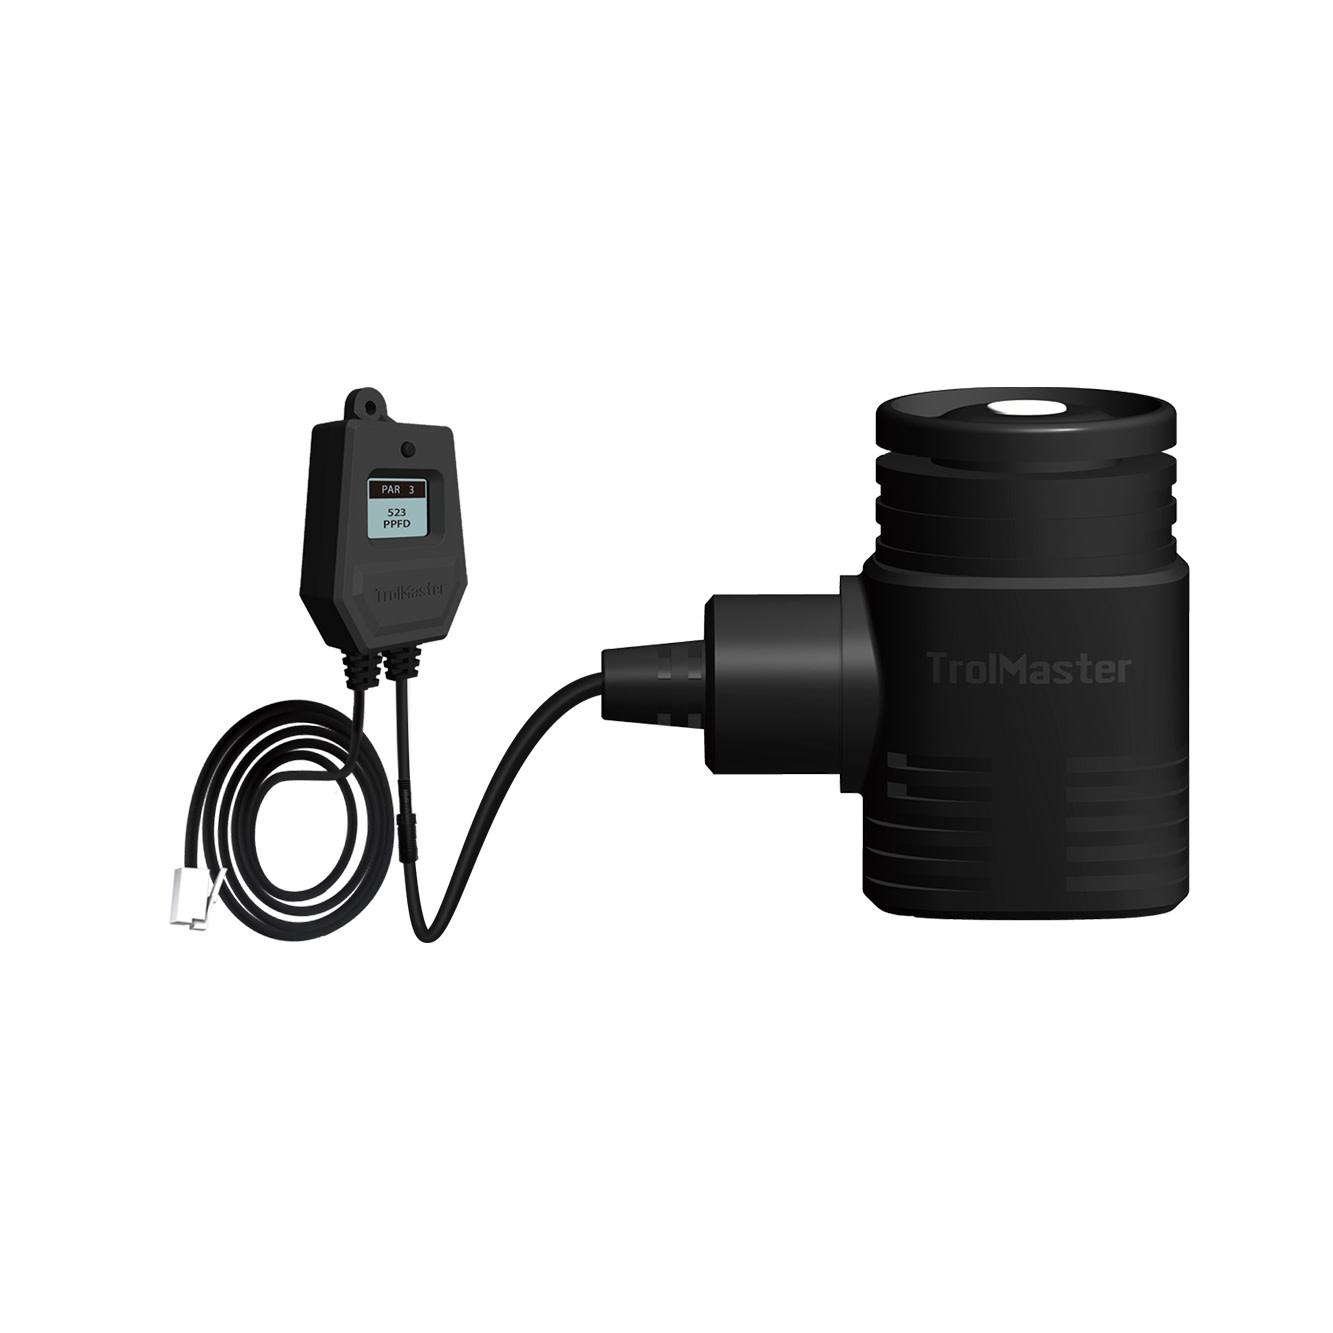 TrolMaster TrolMaster -  Full Spectrum Quantum Sensor (MBS-PAR)